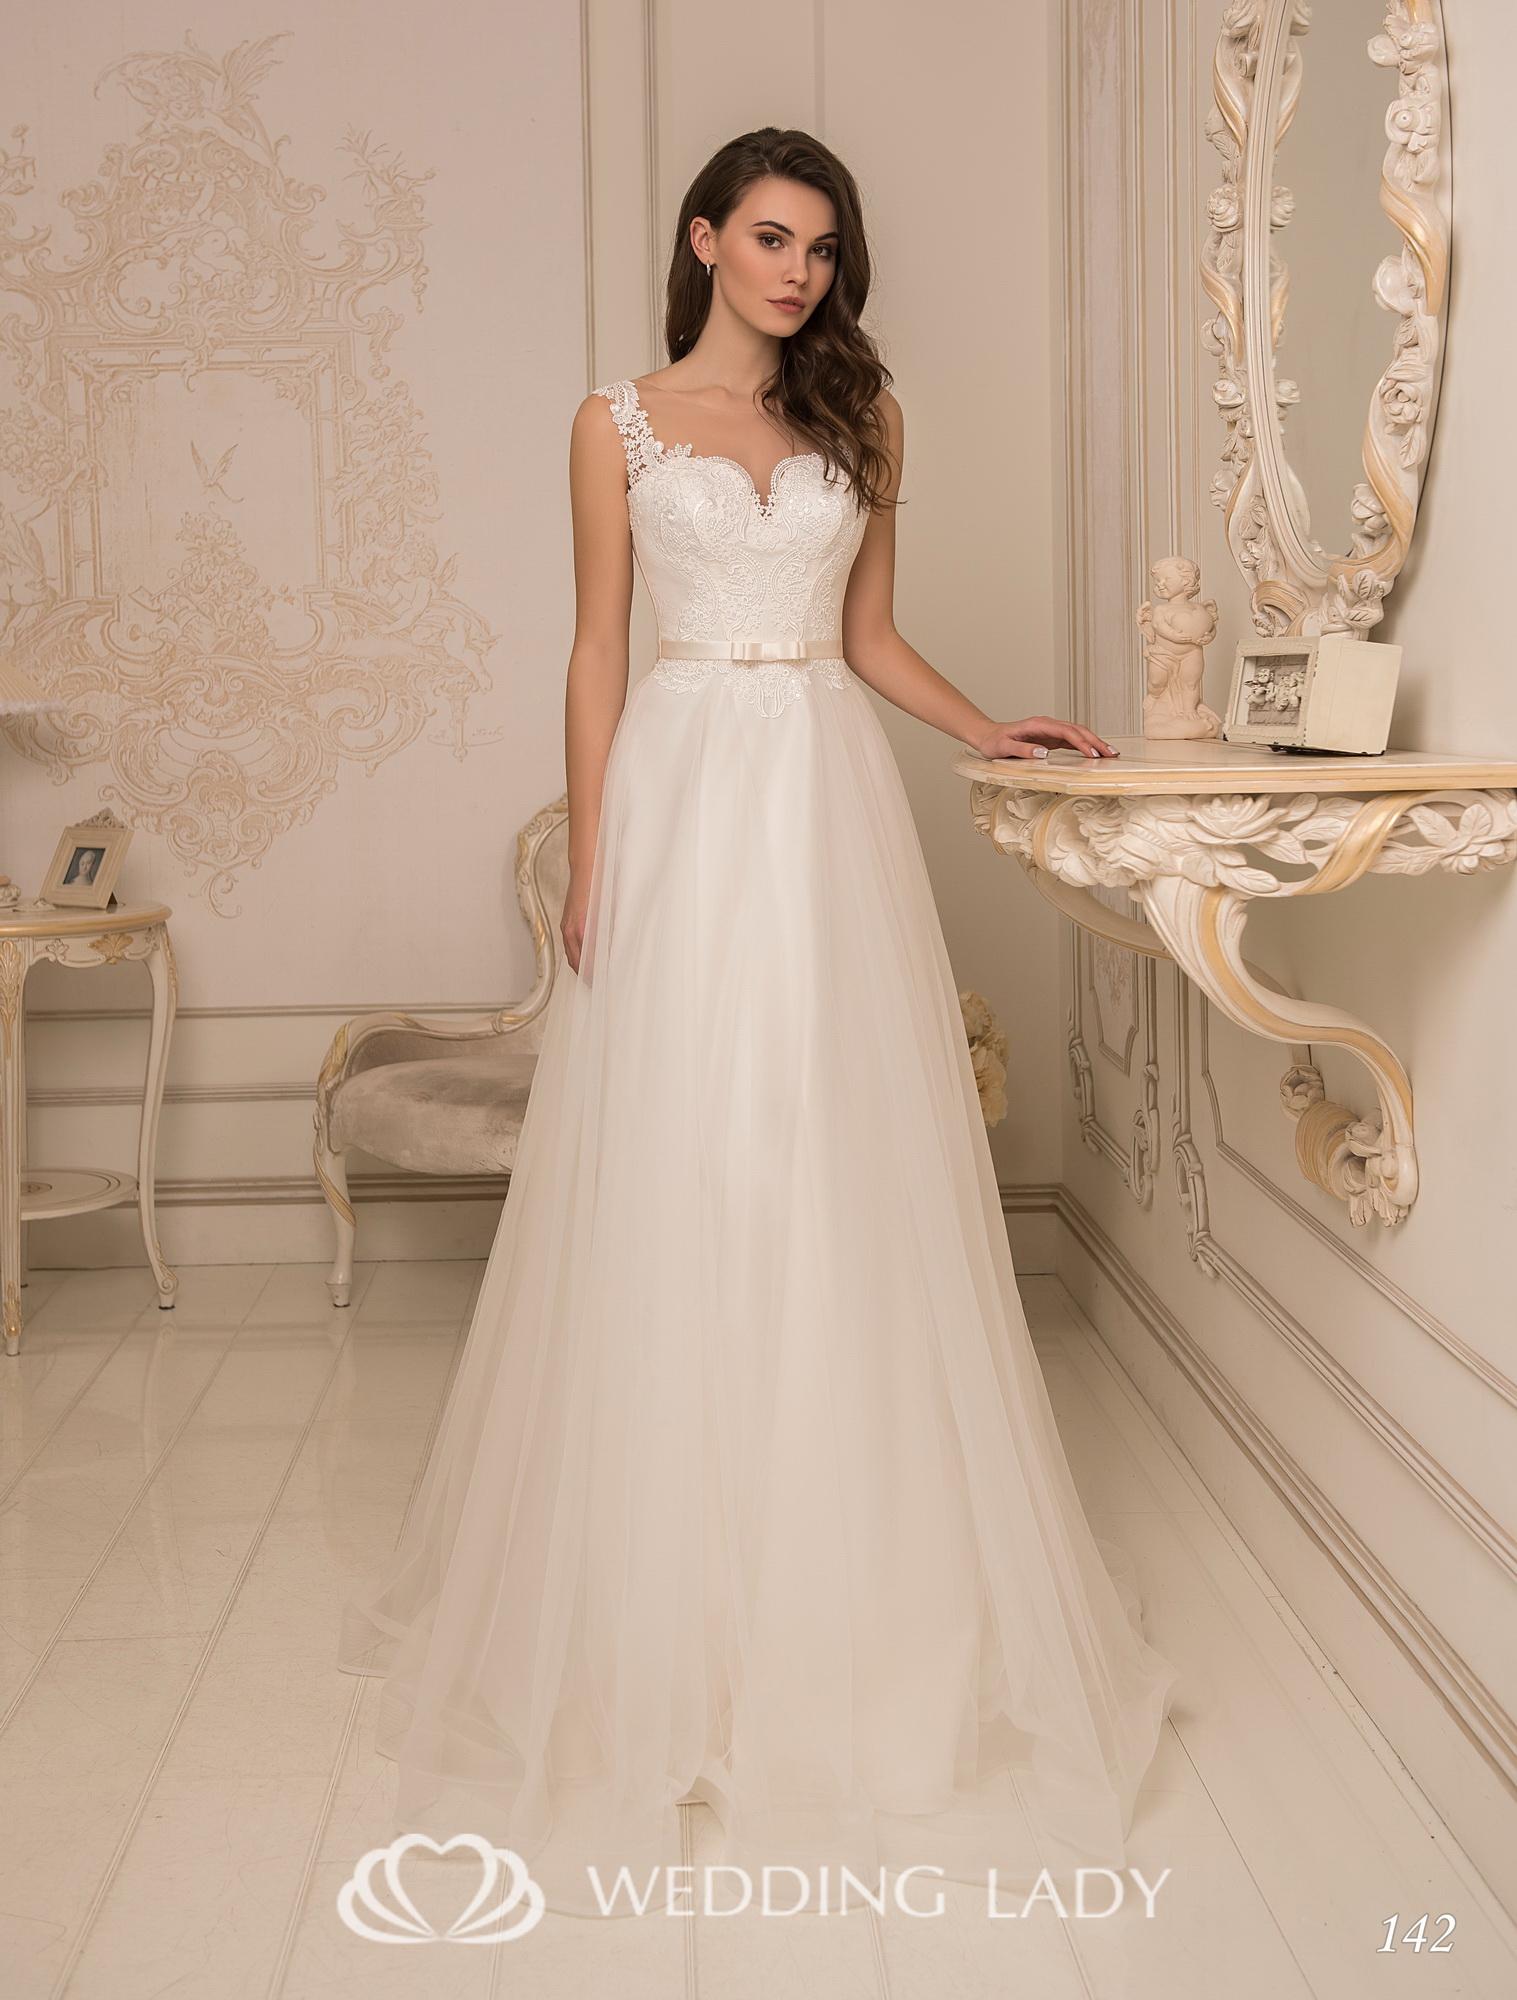 https://wedding-lady.com/images/stories/virtuemart/product/142-------(1).jpg